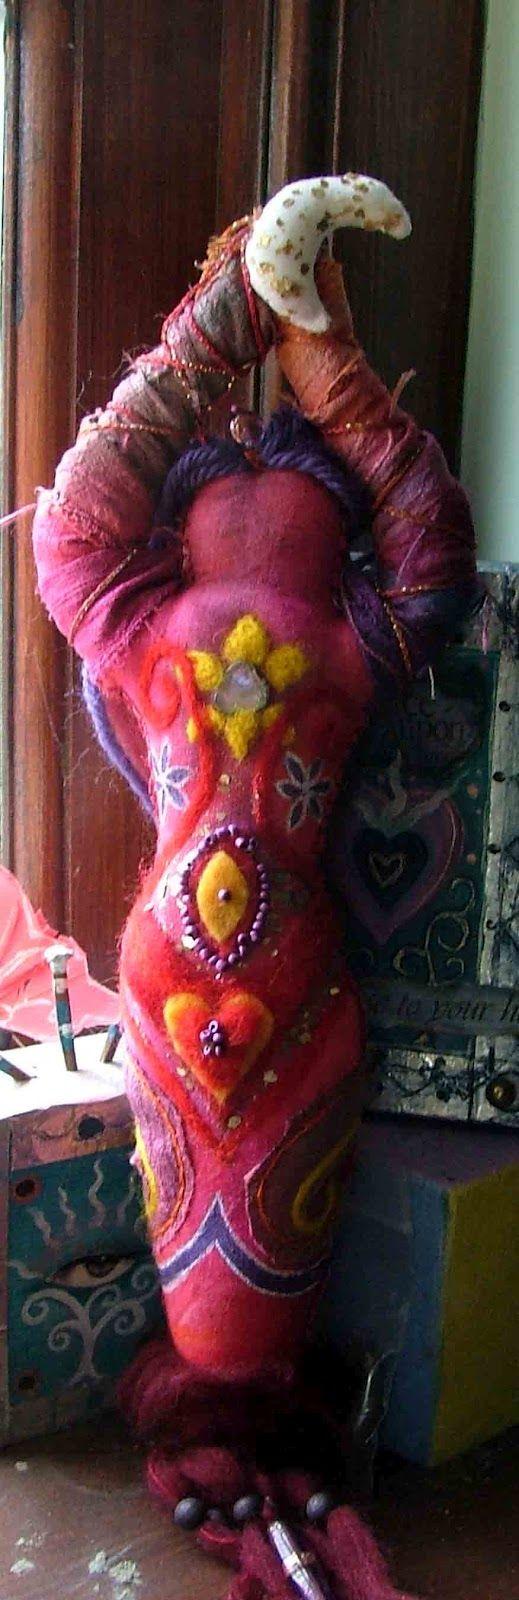 spirit dolls | spirit+dolls+by+Amanda+Clark+038.jpg